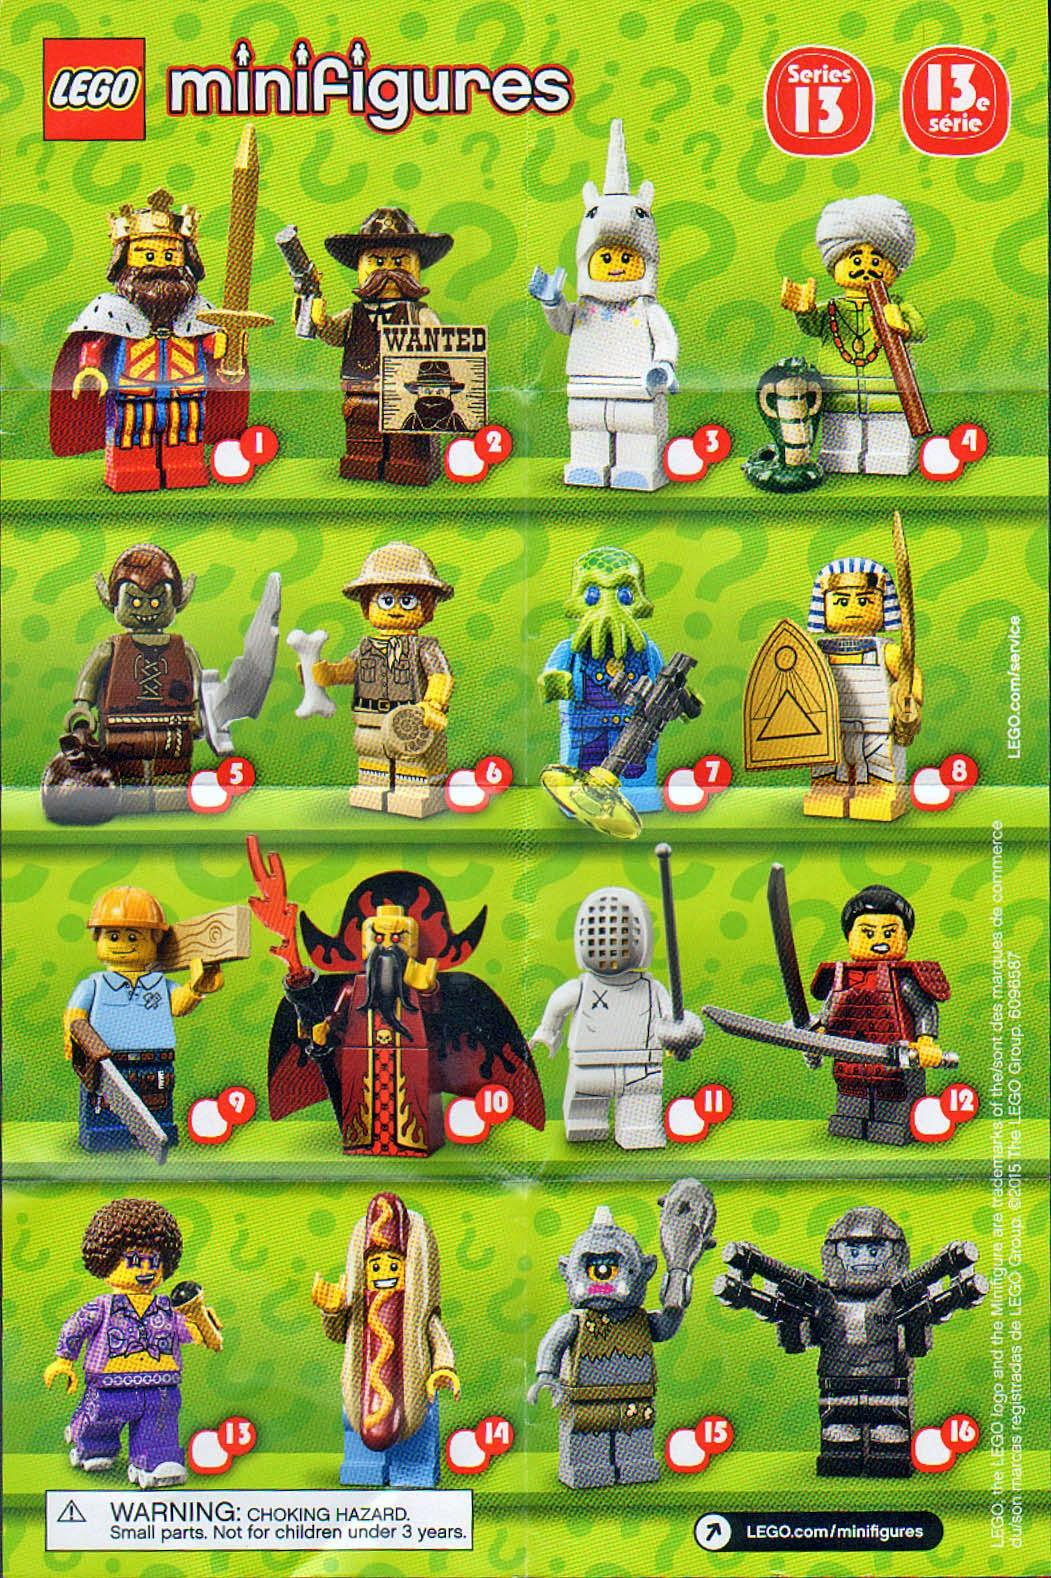 Lego minifigure series 1 16 lego movie simpson disney checklists